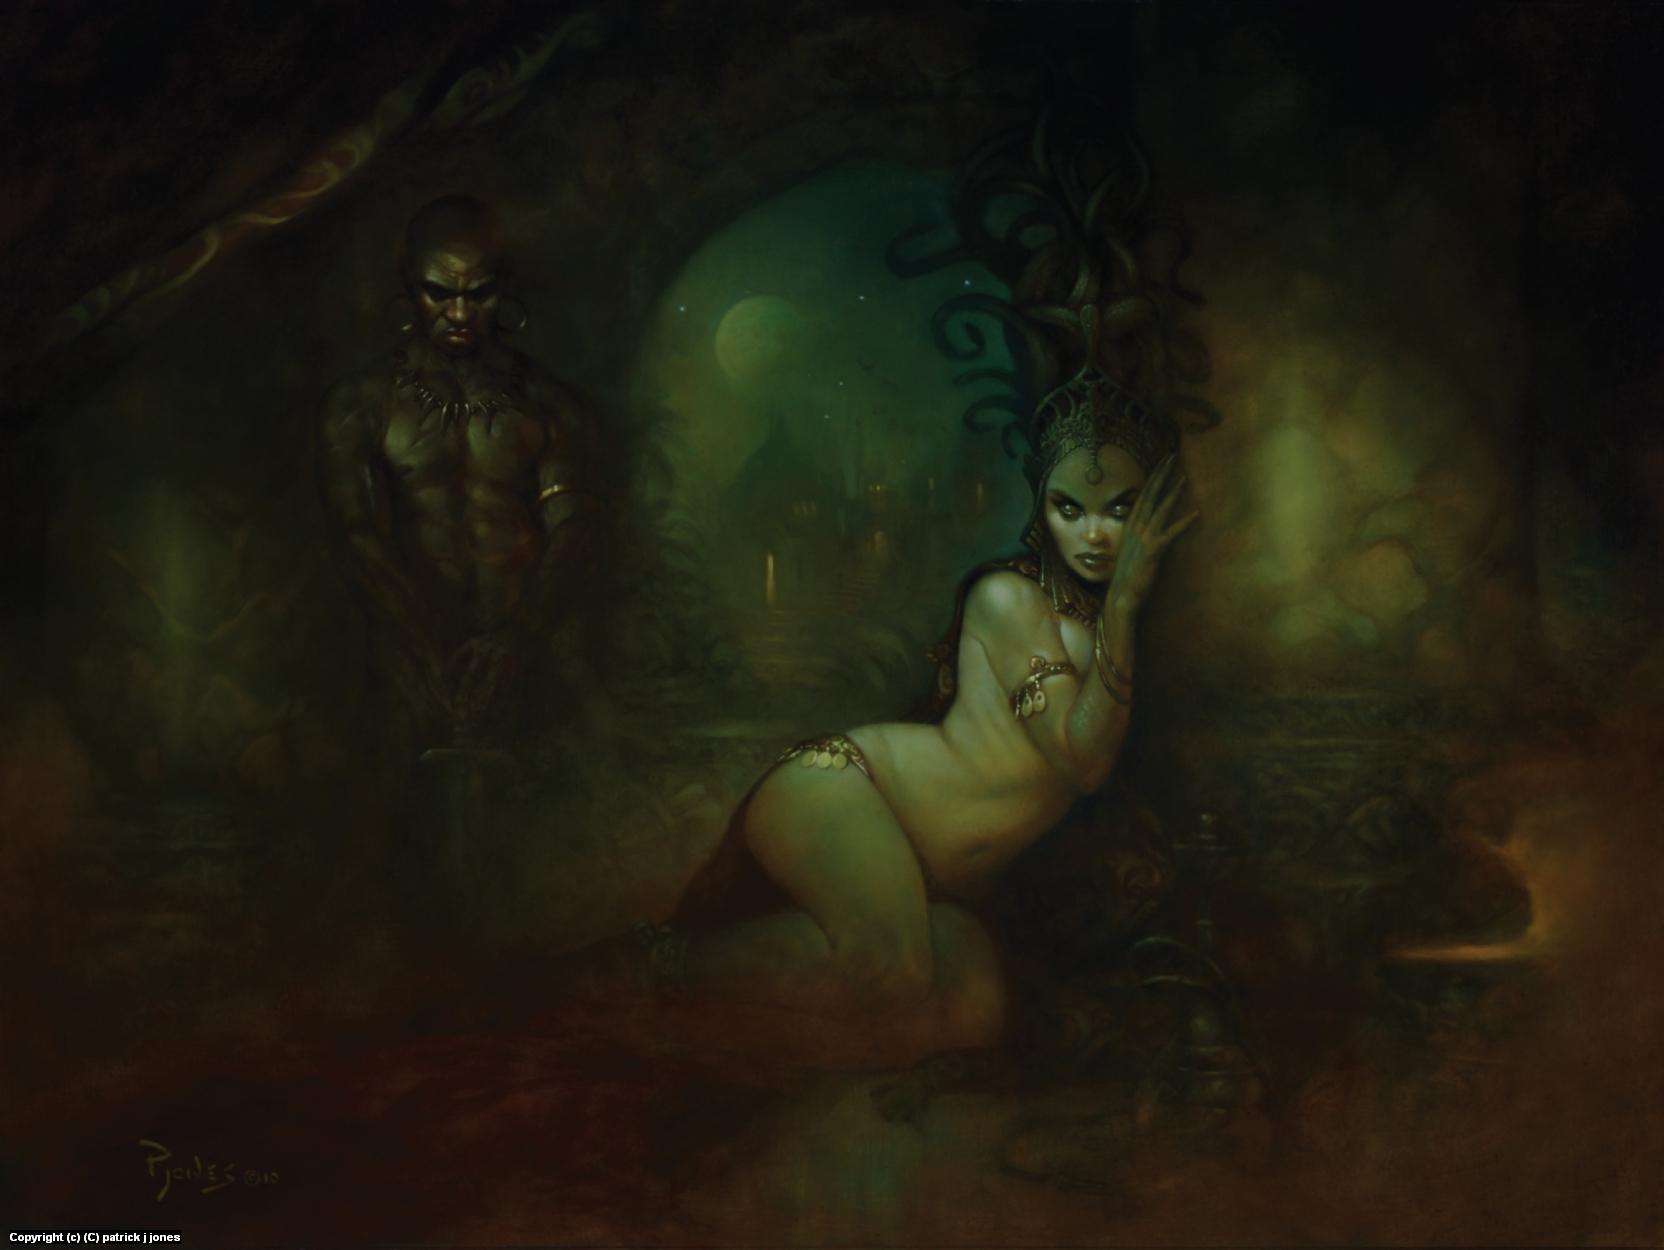 Palace of Medusa Artwork by patrick jones